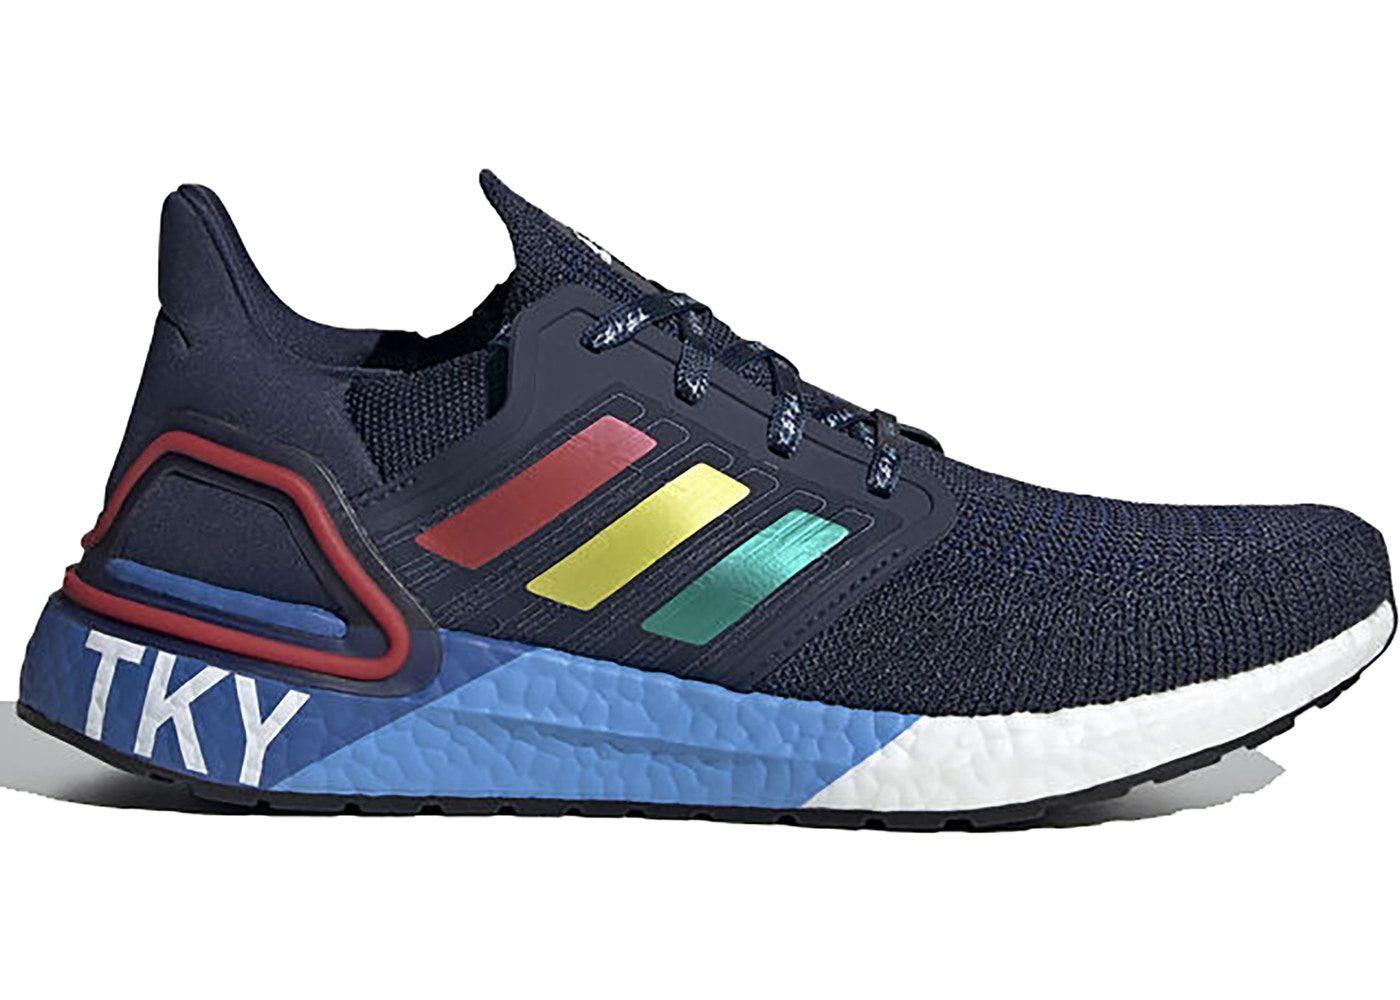 Adidas Ultra Boost 20 Tokyo